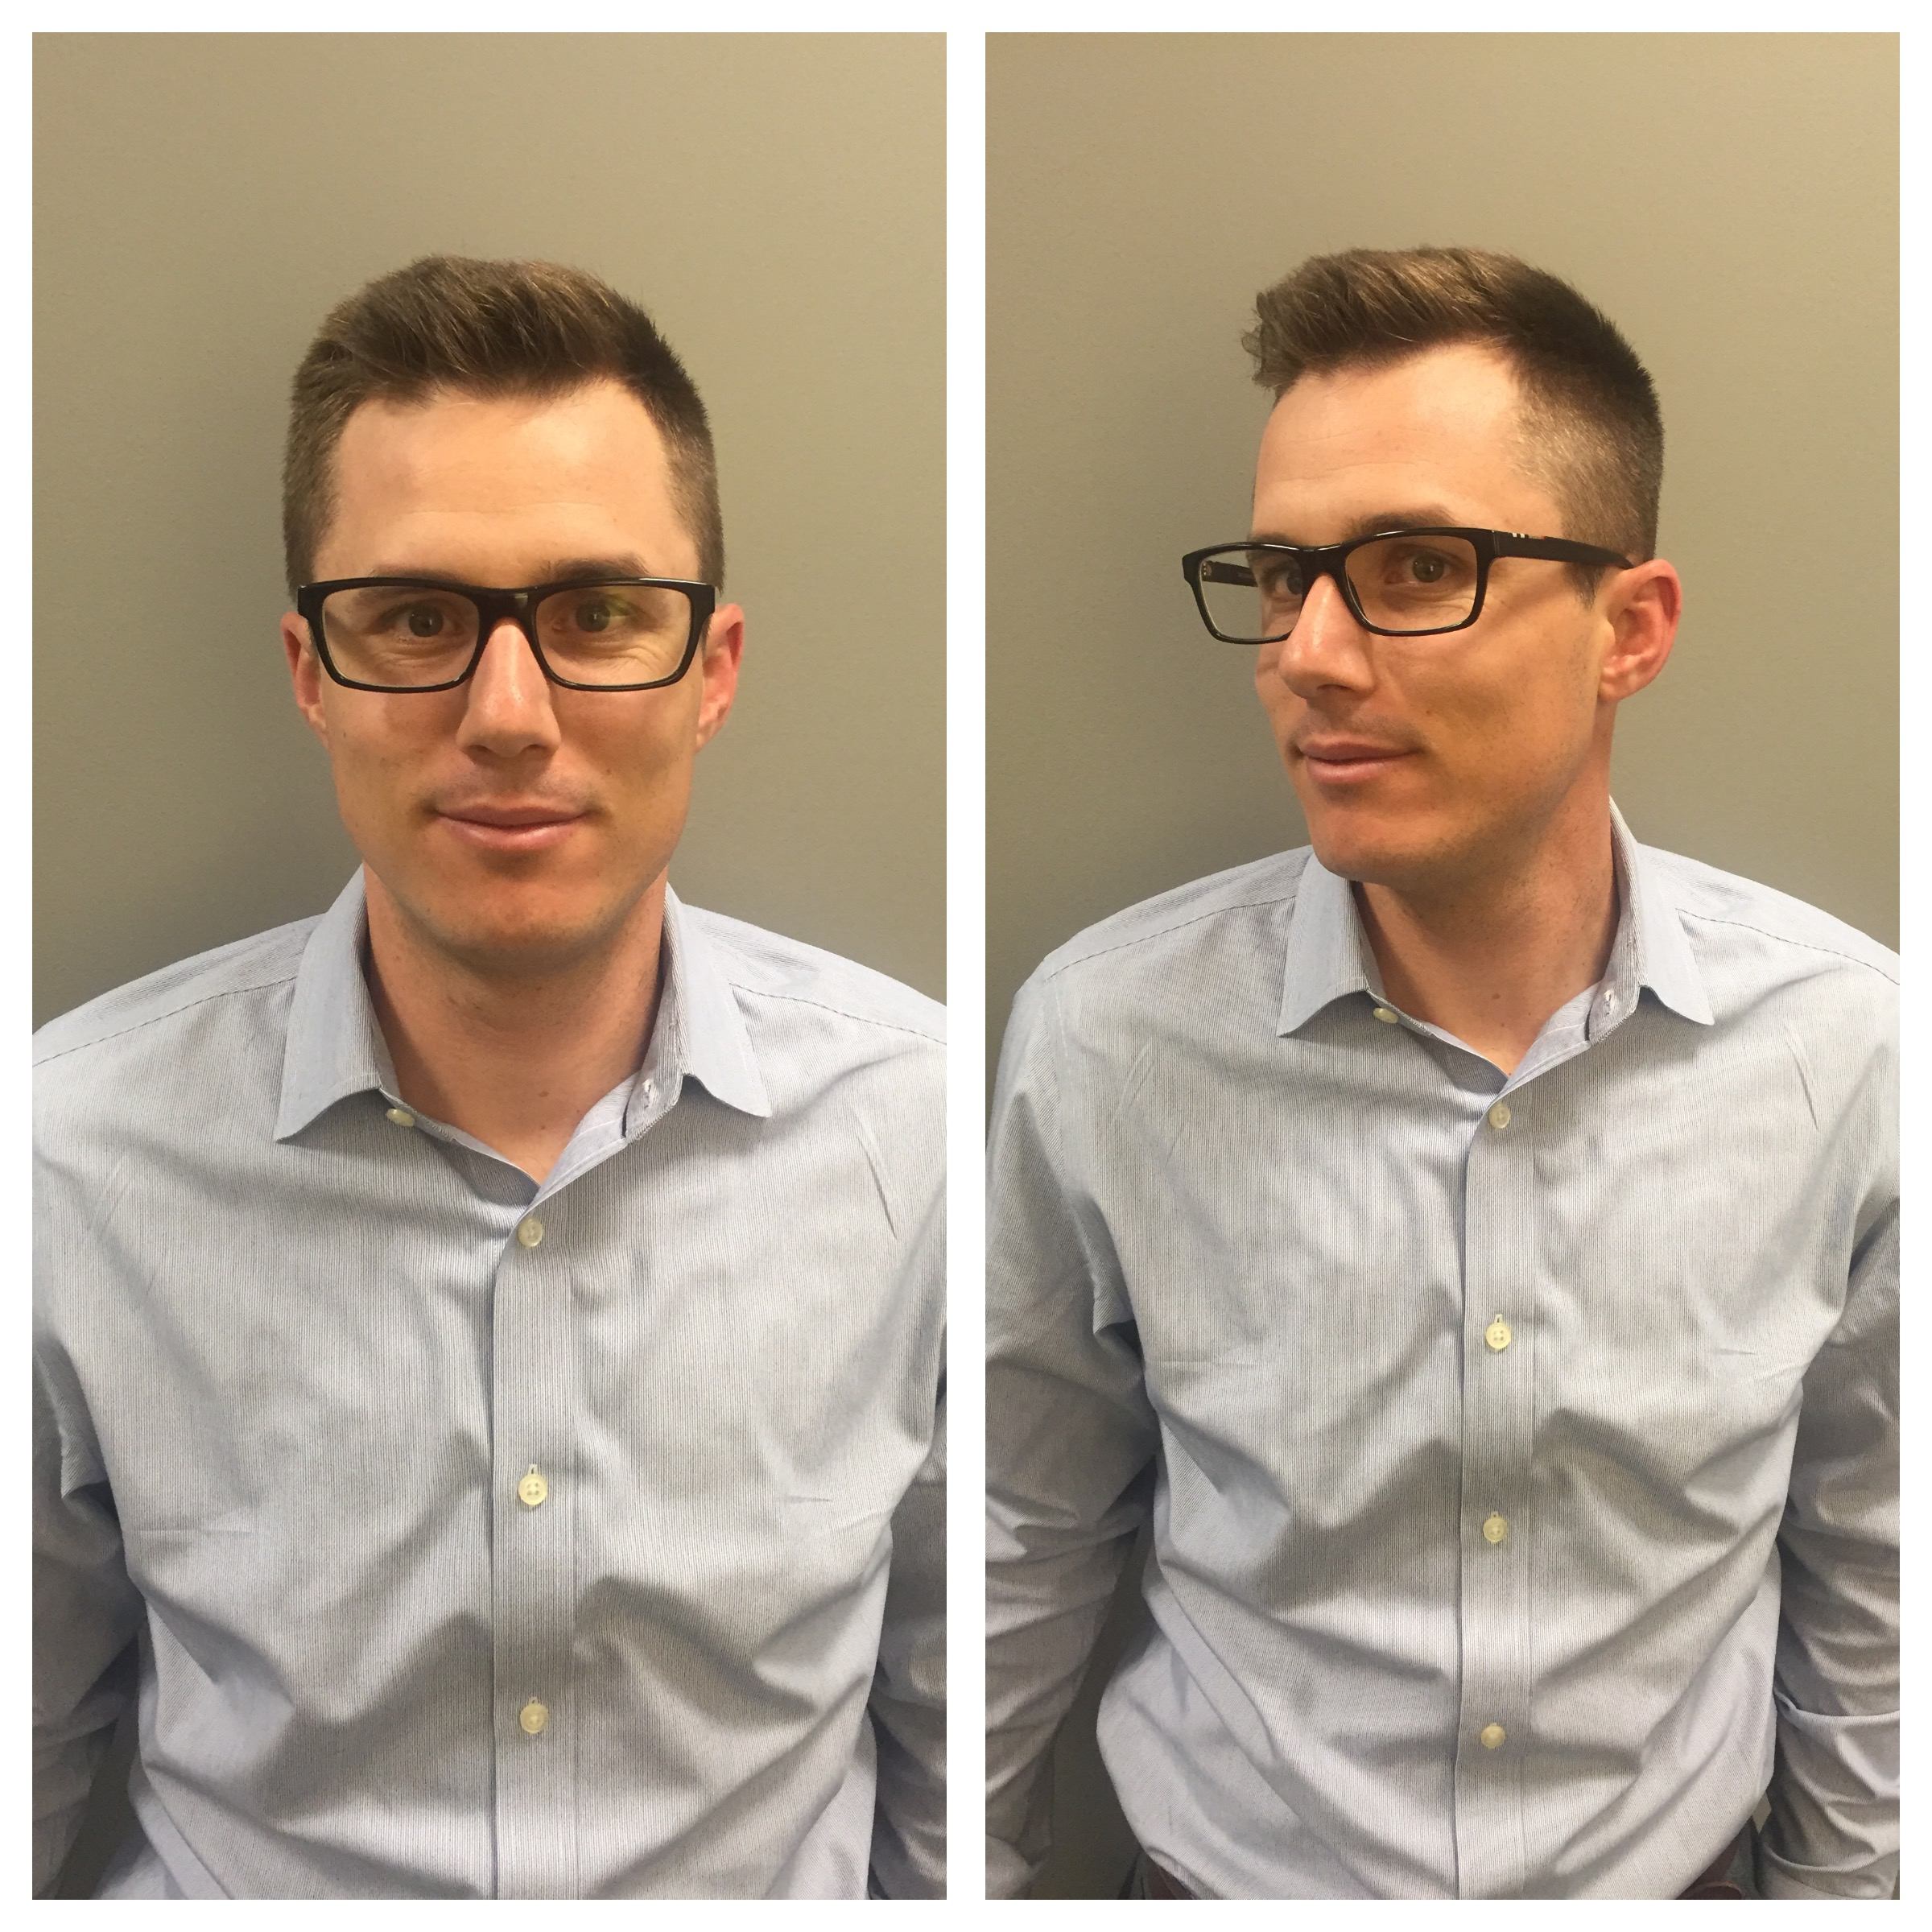 Men's short professional haircut